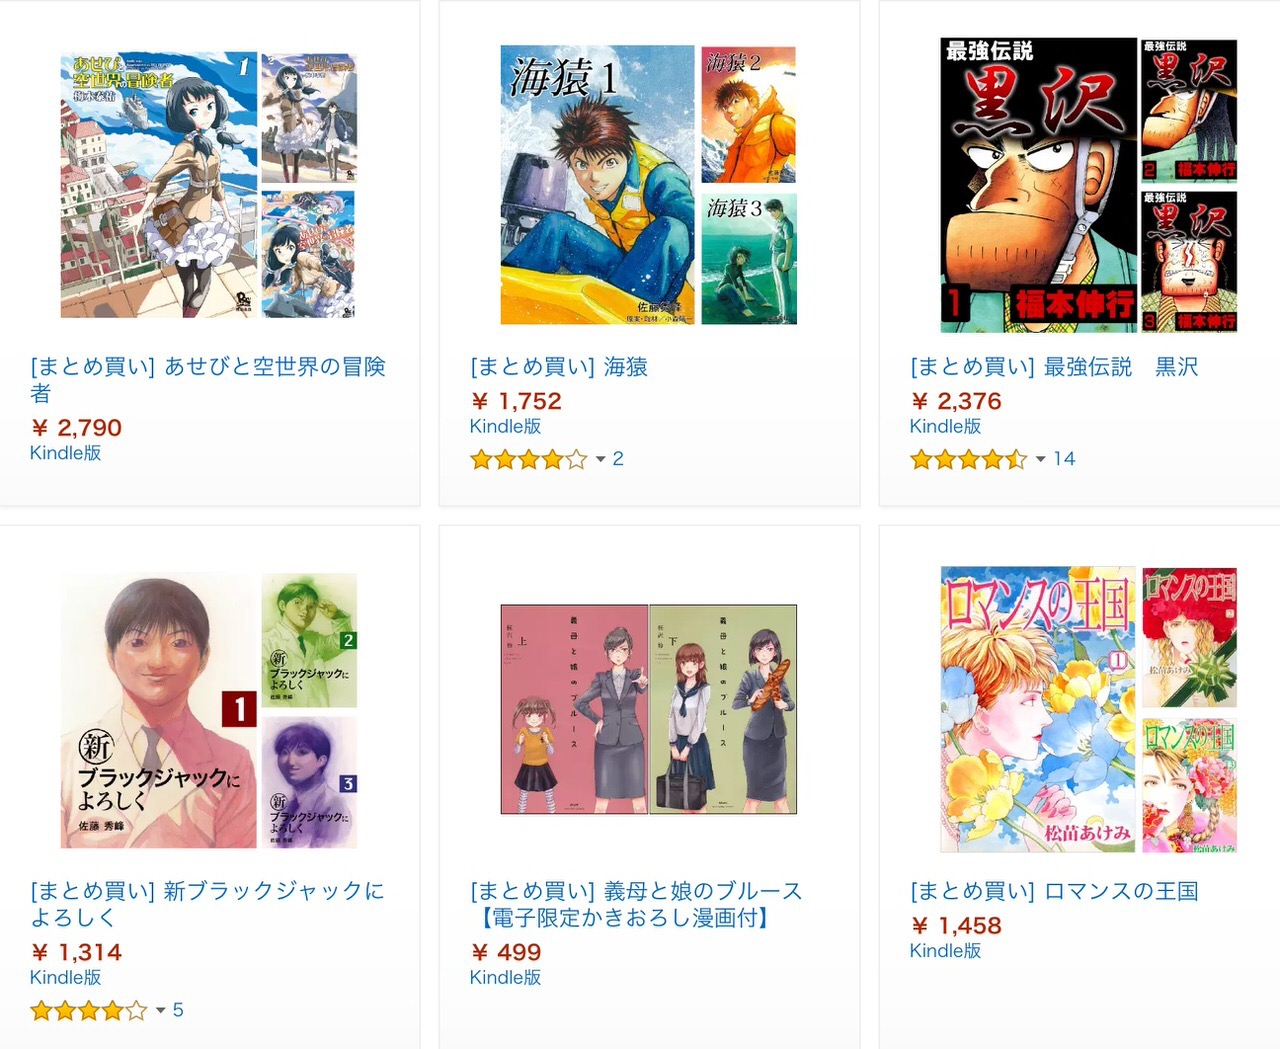 【Kindleセール】3,000冊以上が対象!50%OFF以上「マンガ ウィンターセール」(12/11まで)